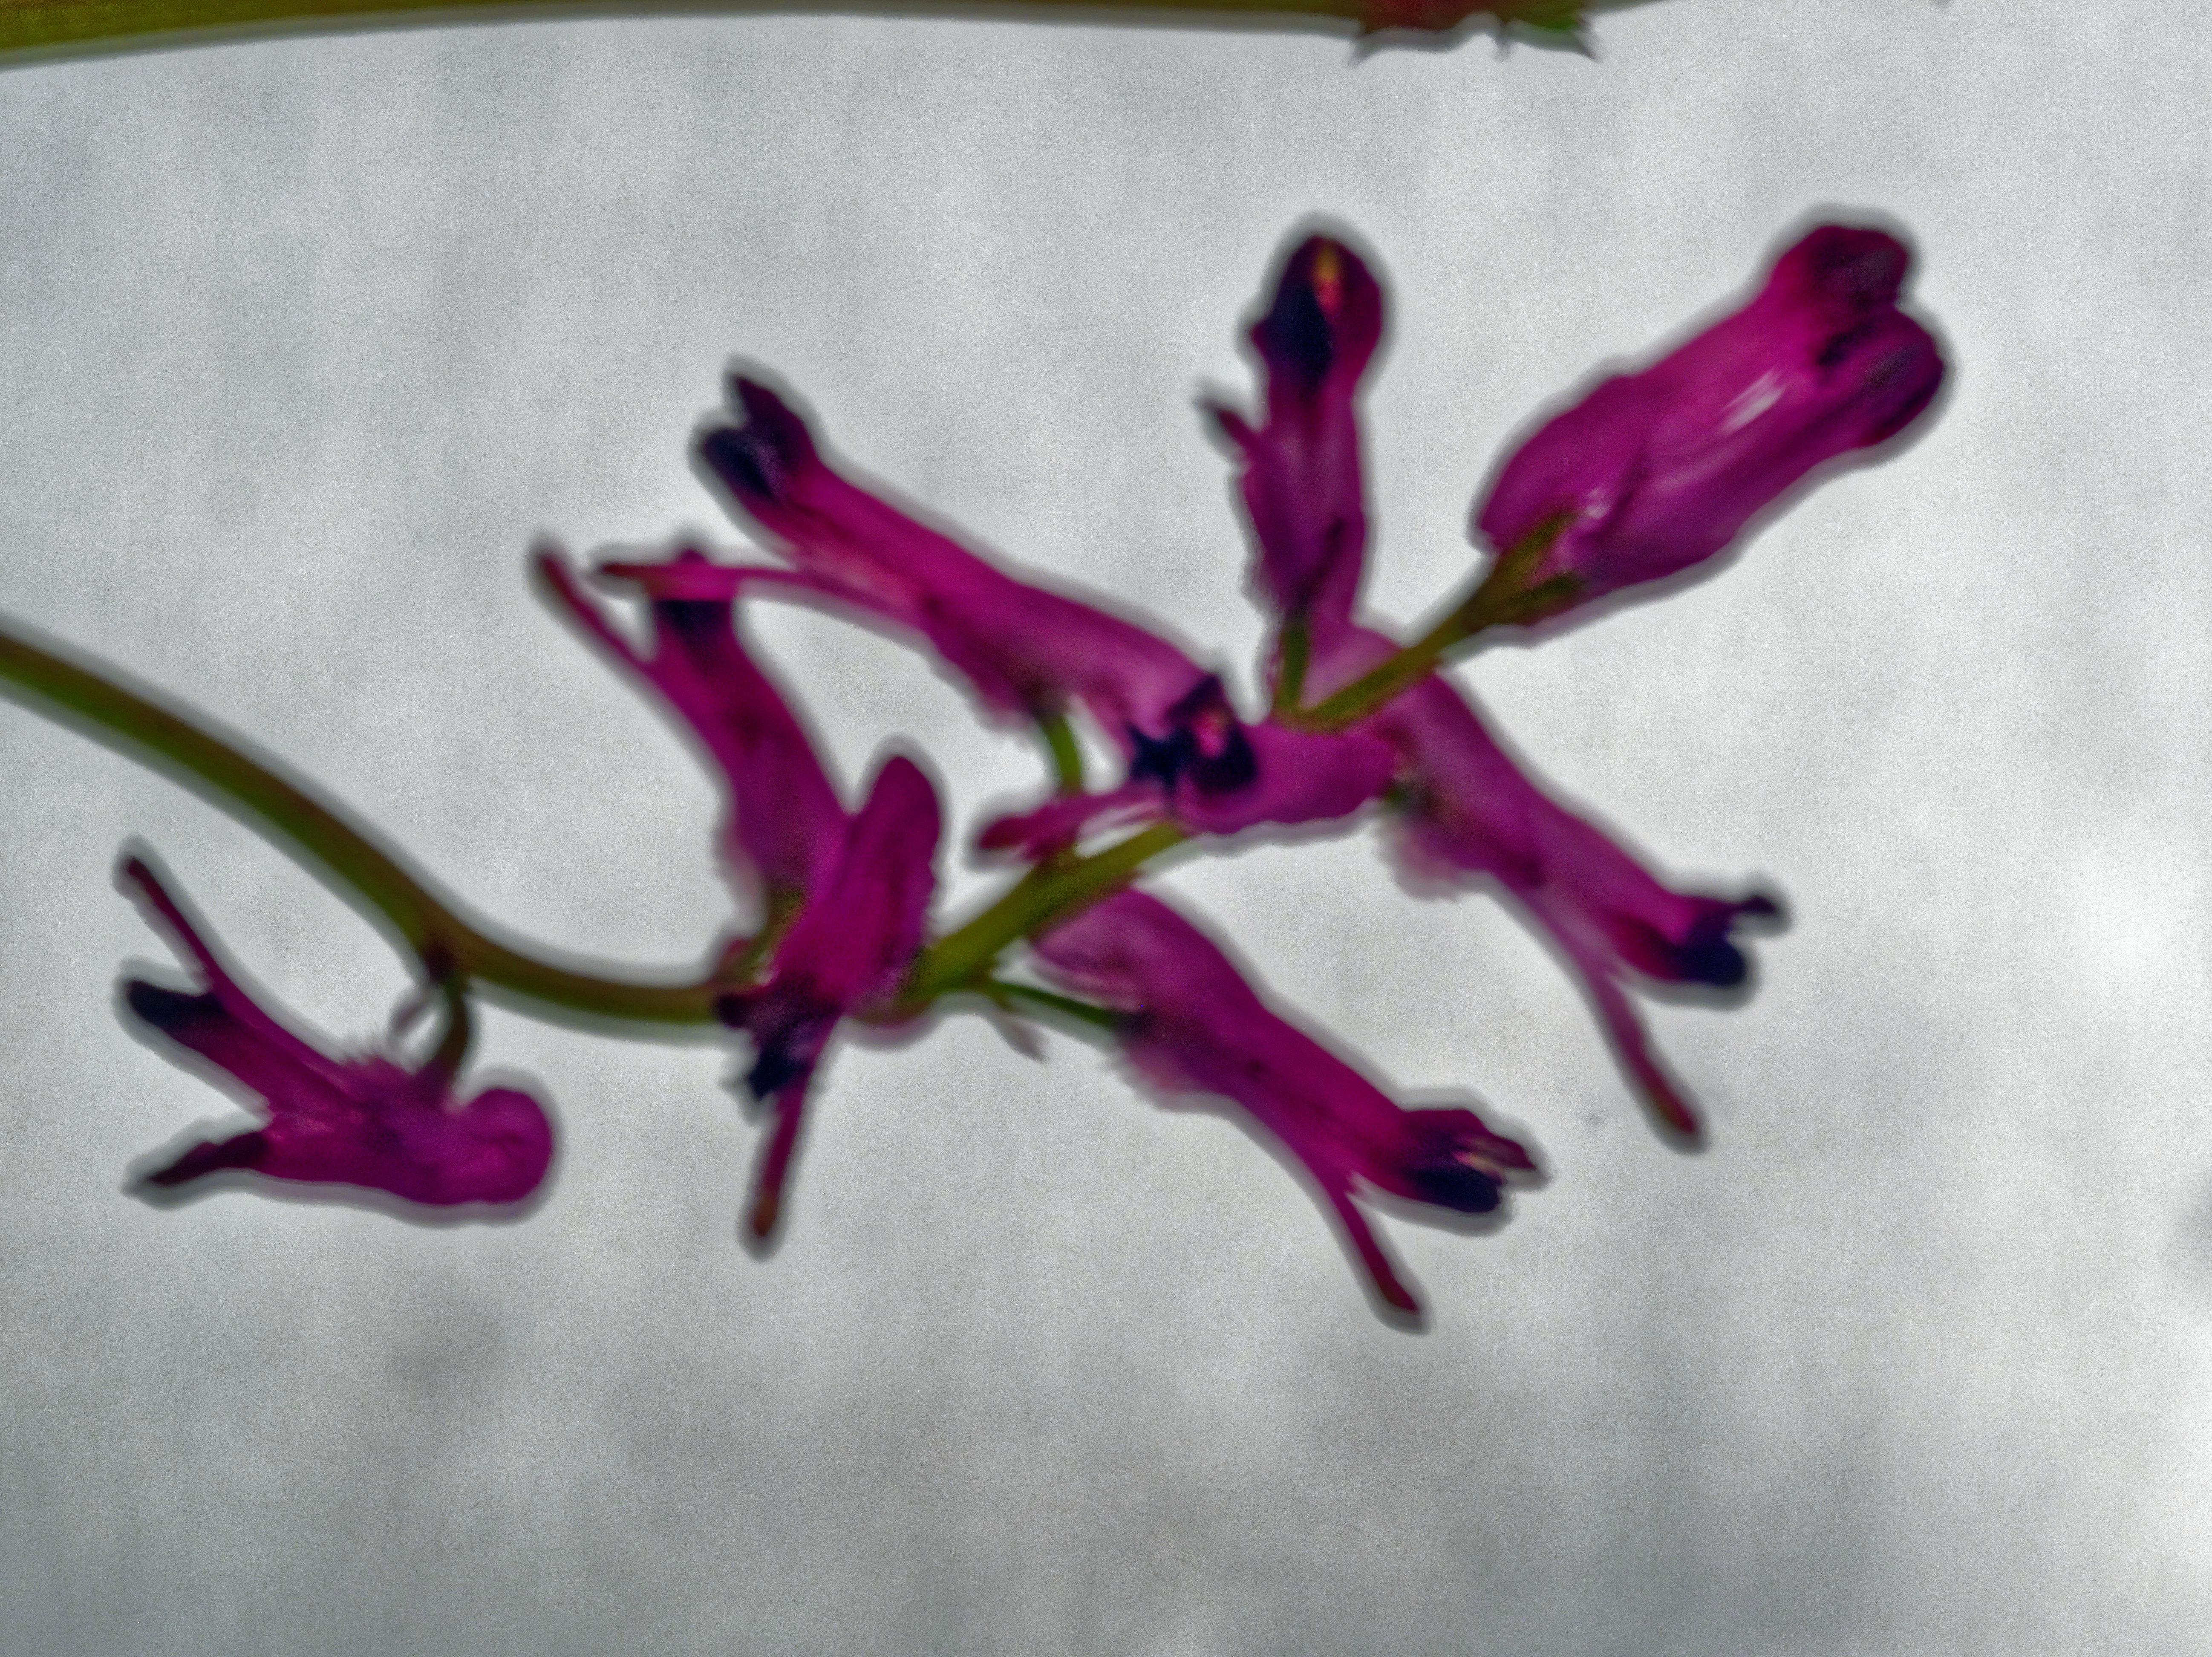 Wildflowers-7.jpeg